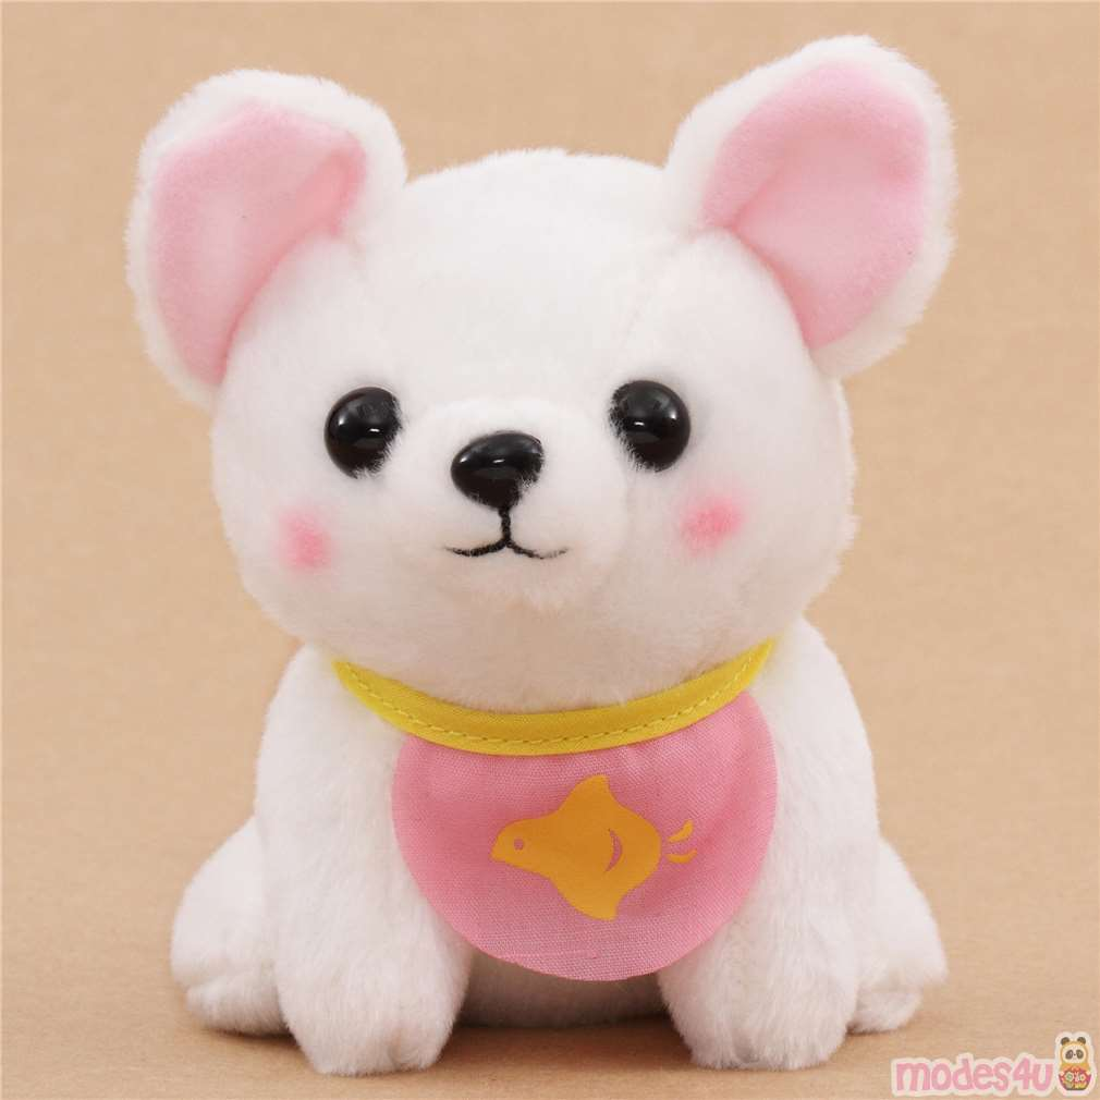 White Cute Mameshiba San Kyodai Pink Bib Dog Plush Toy From Japan